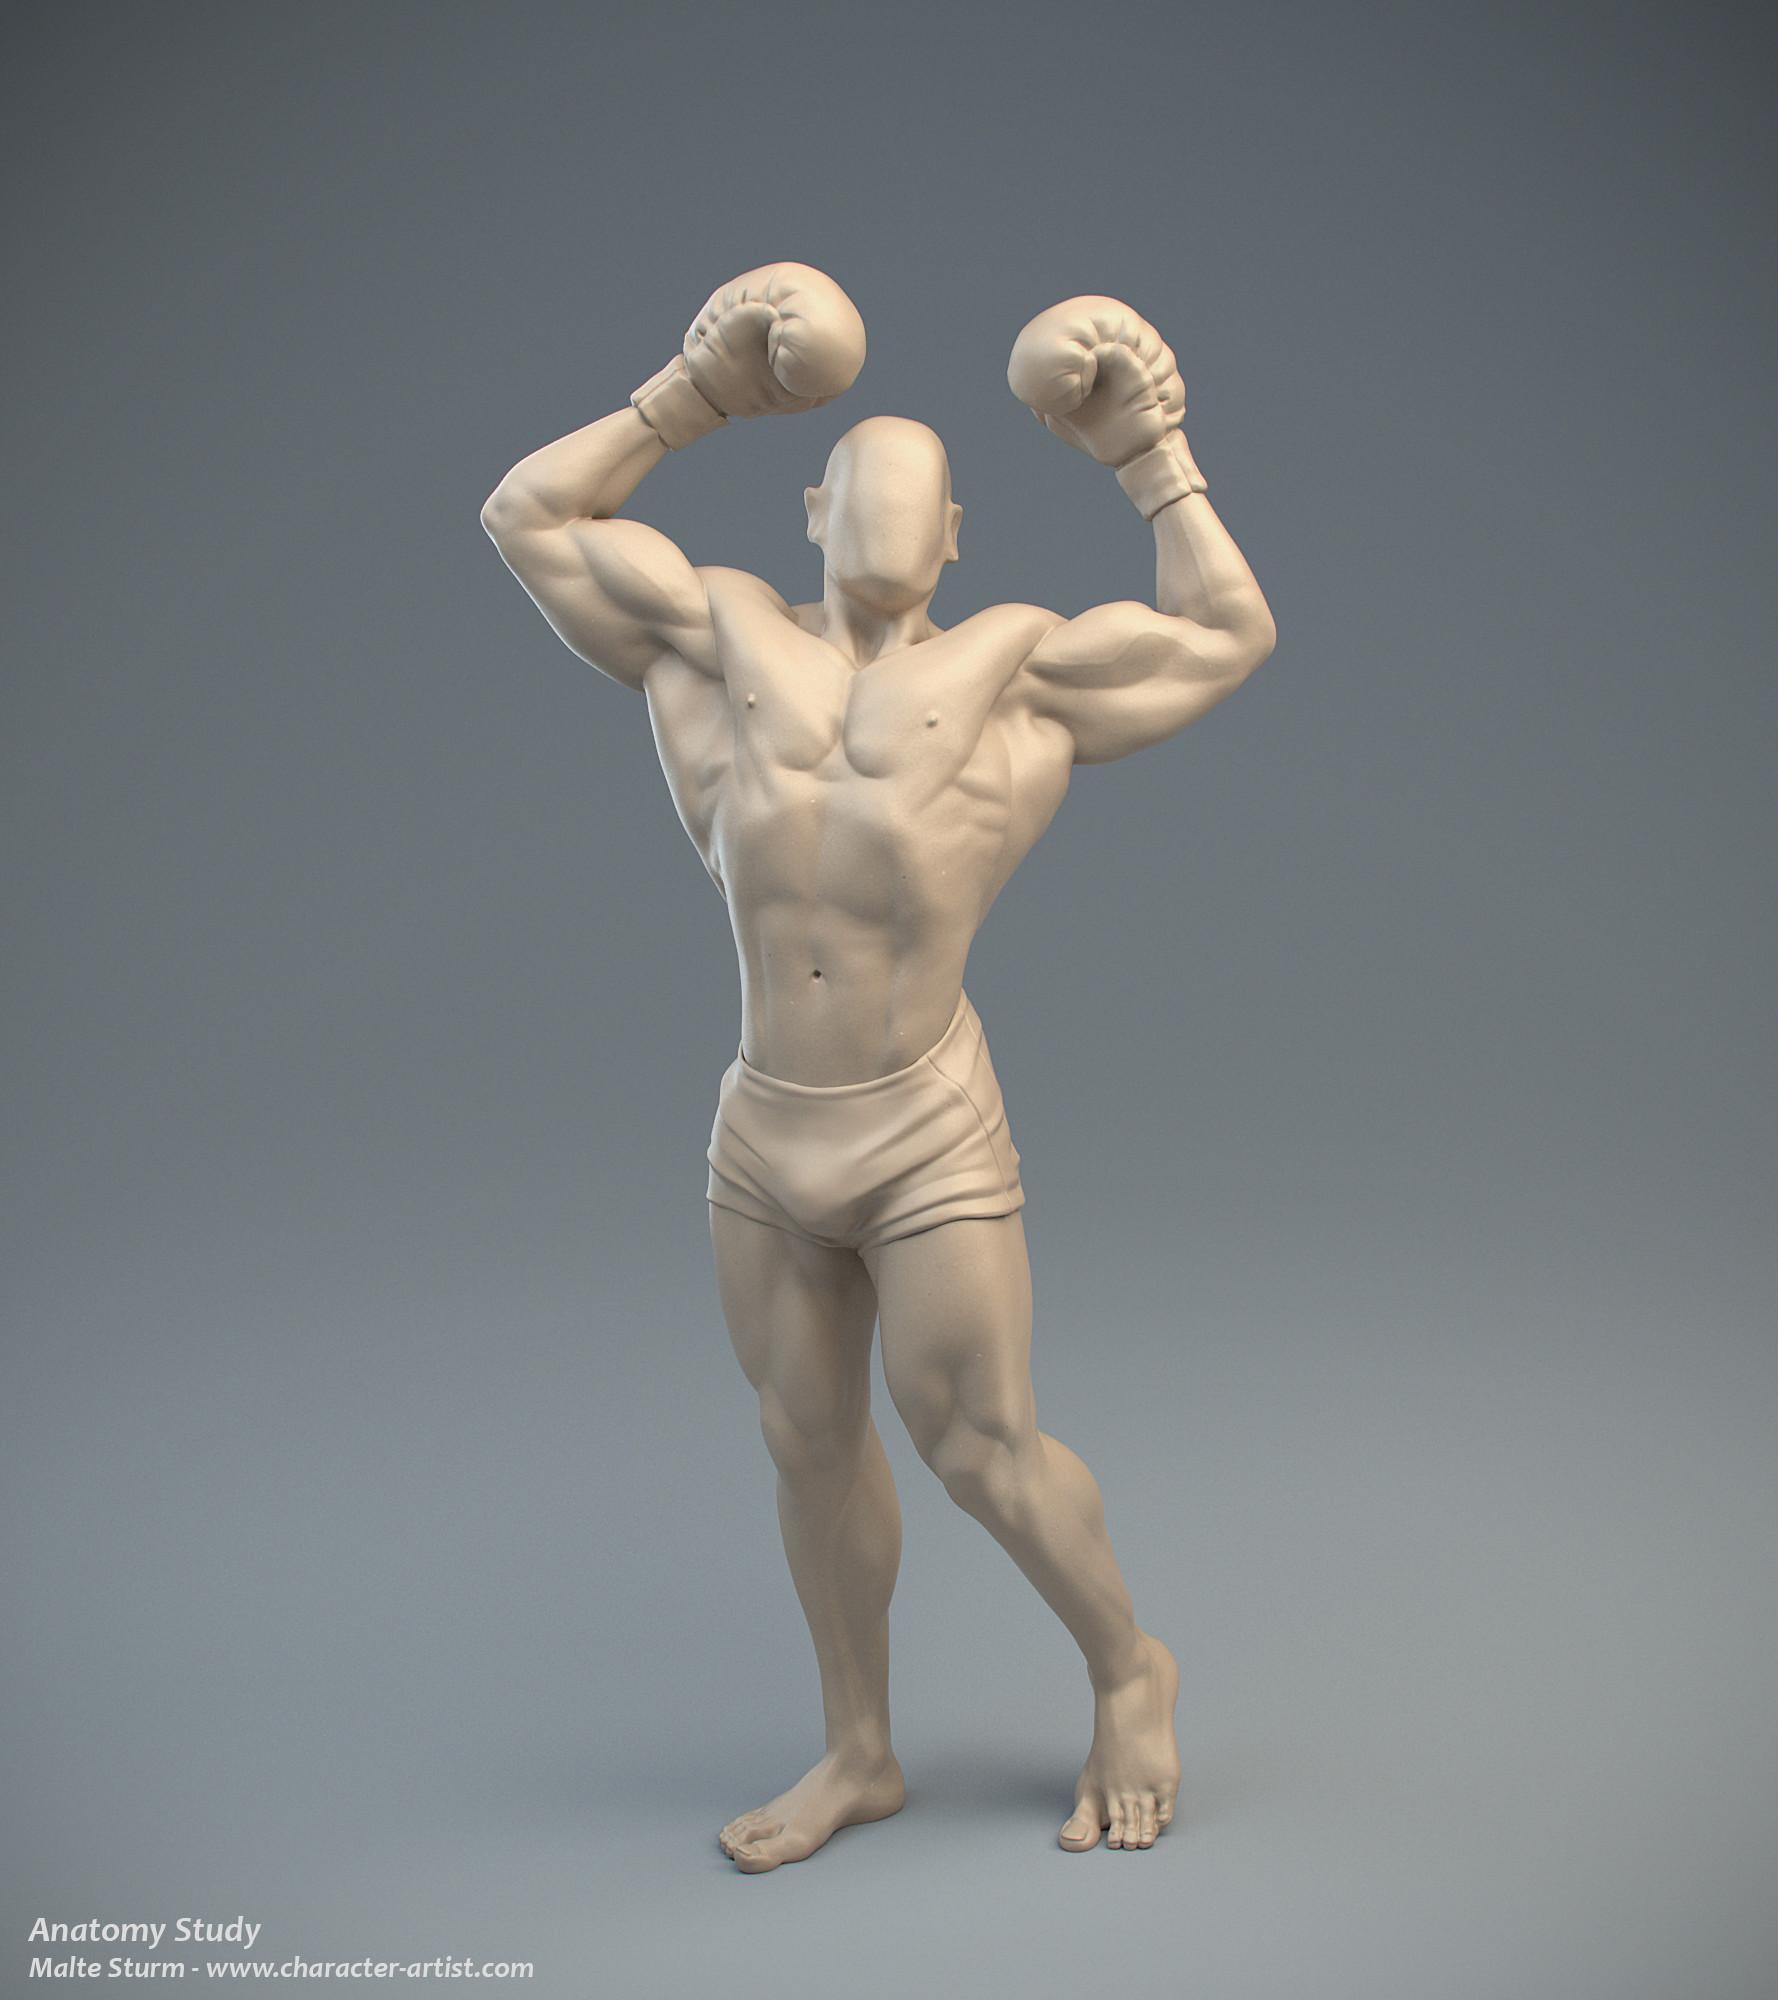 3D Character Artist Malte Sturm - Anatomy study